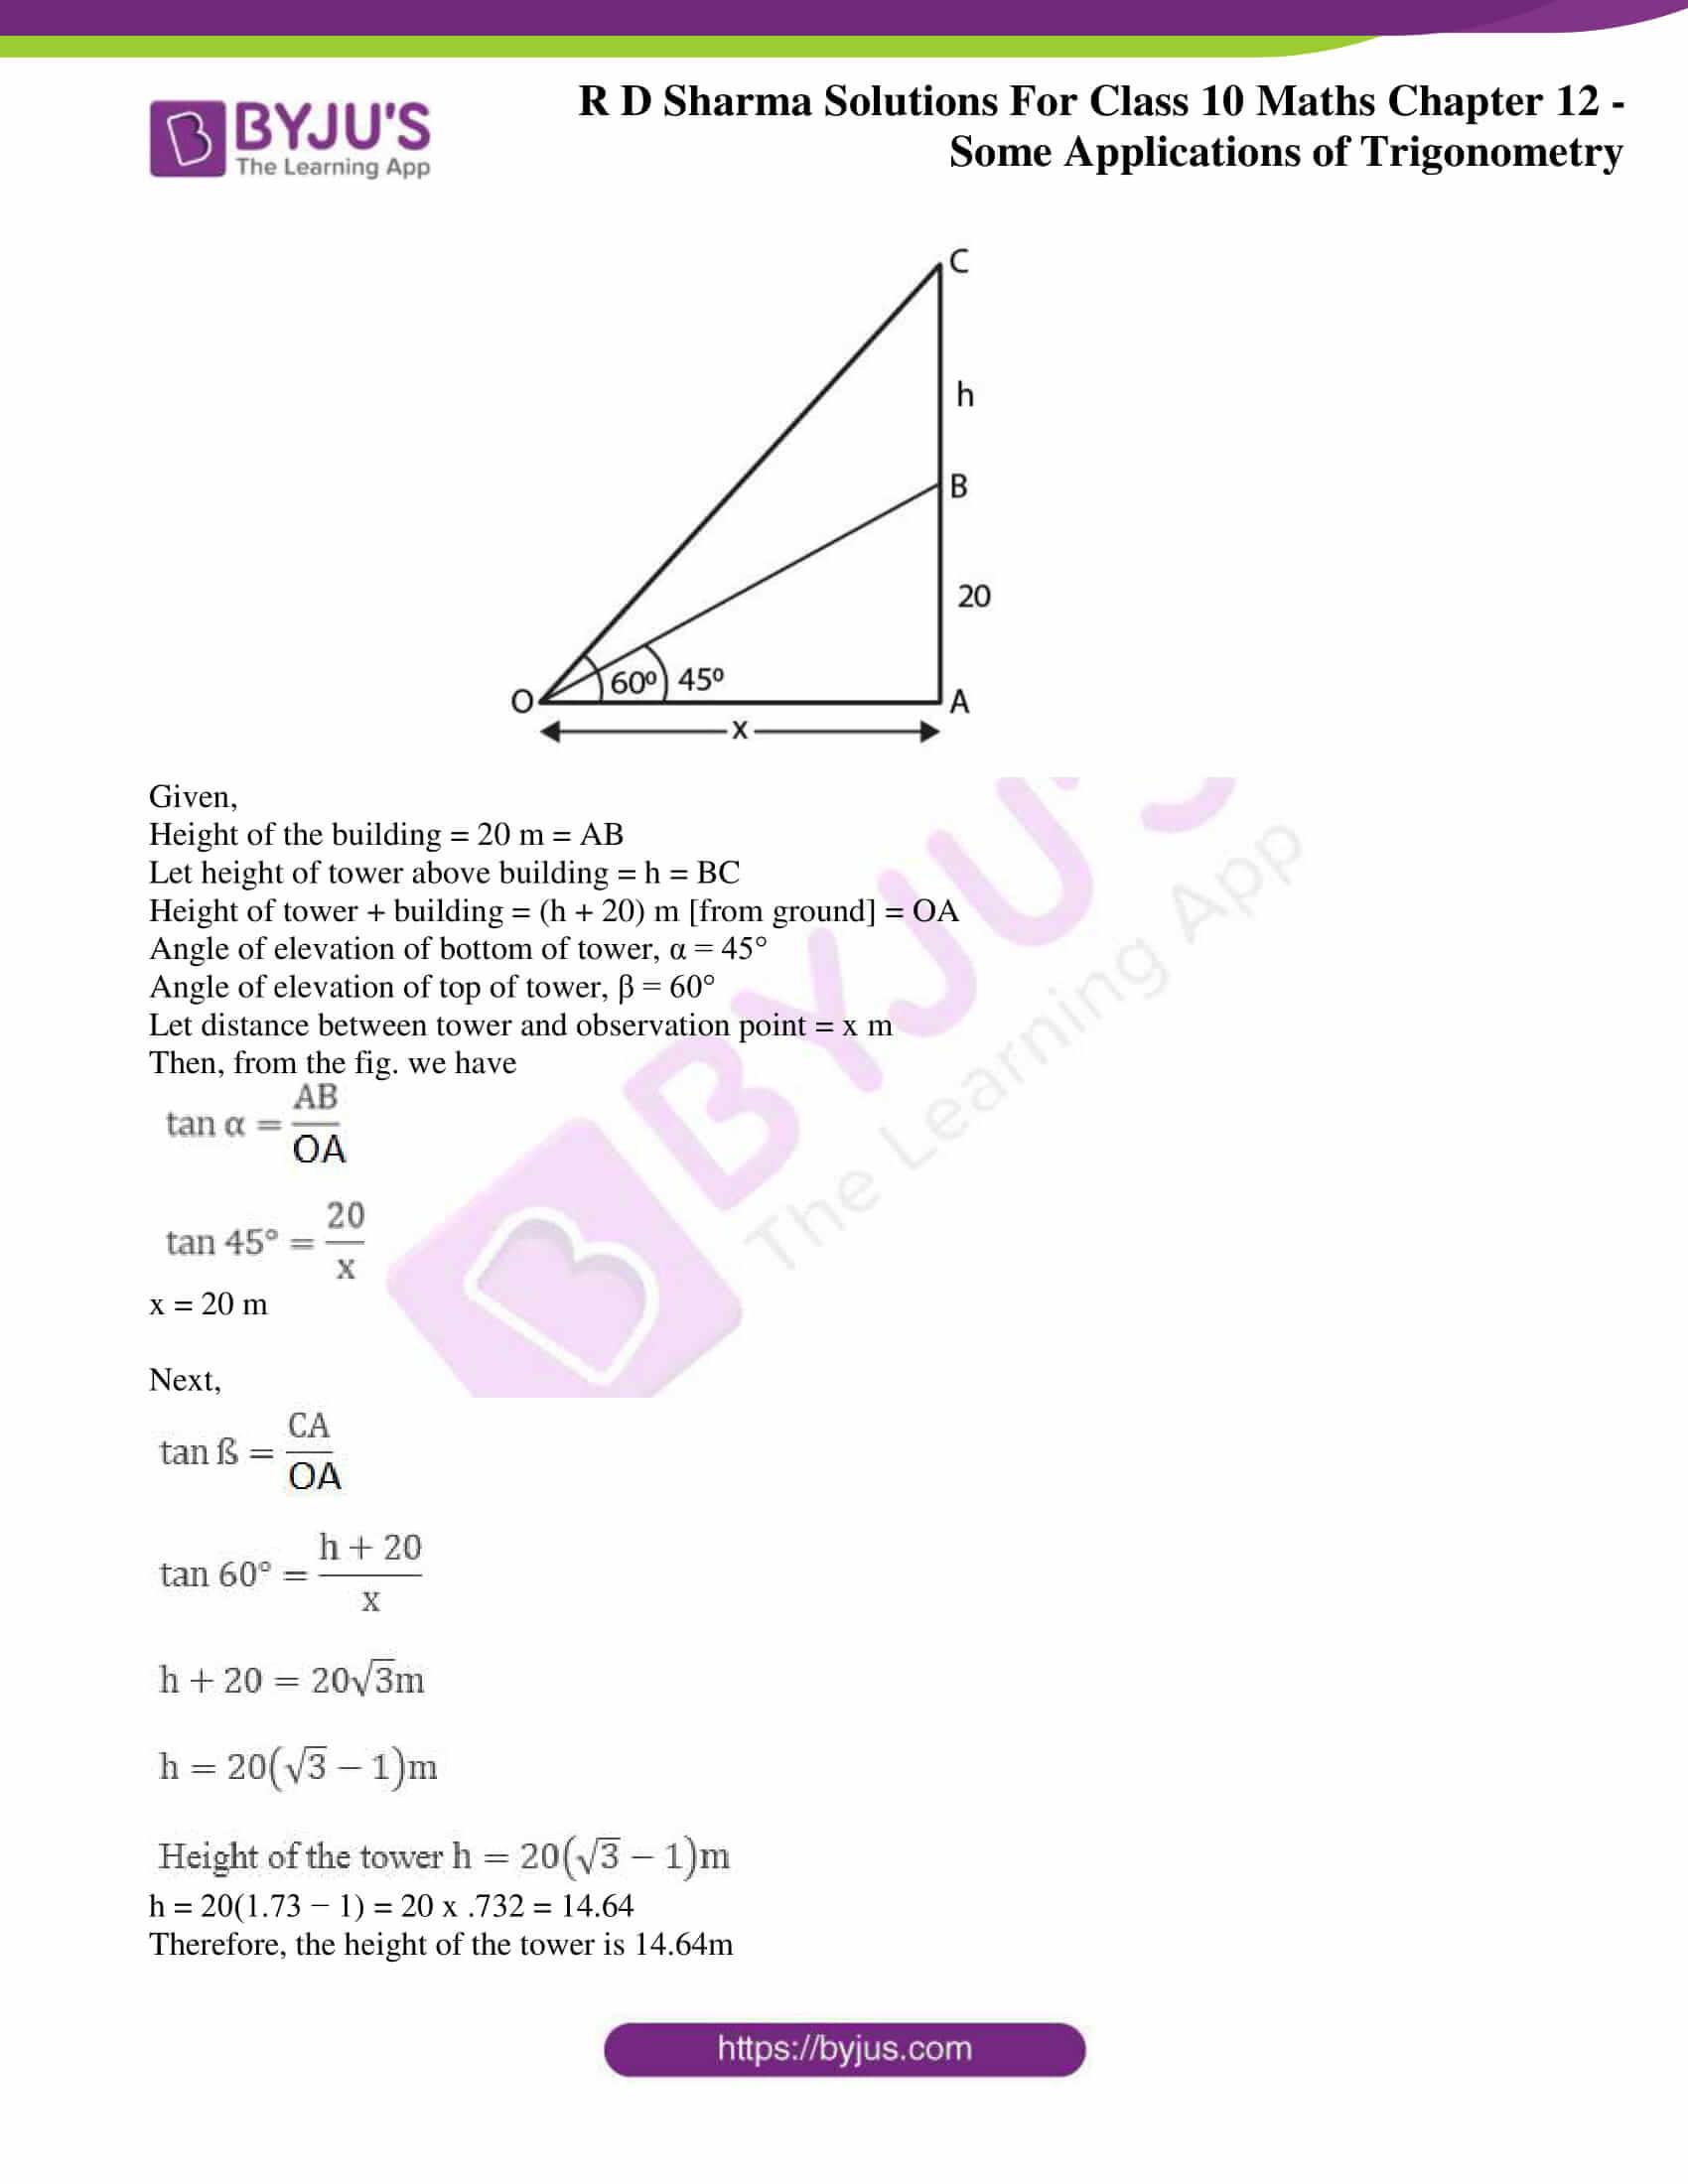 rd sharma class 10 chapter 12 applications trigonometry solutions 23